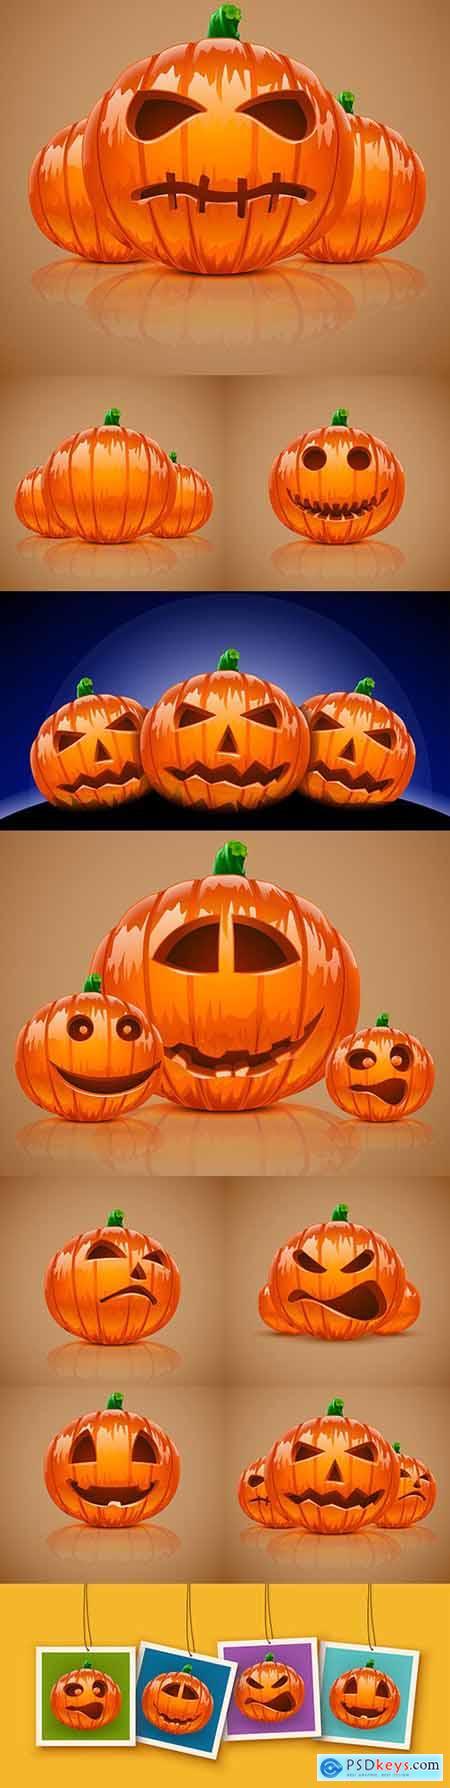 Halloween orange Pumpkin cartoon emotions illustration